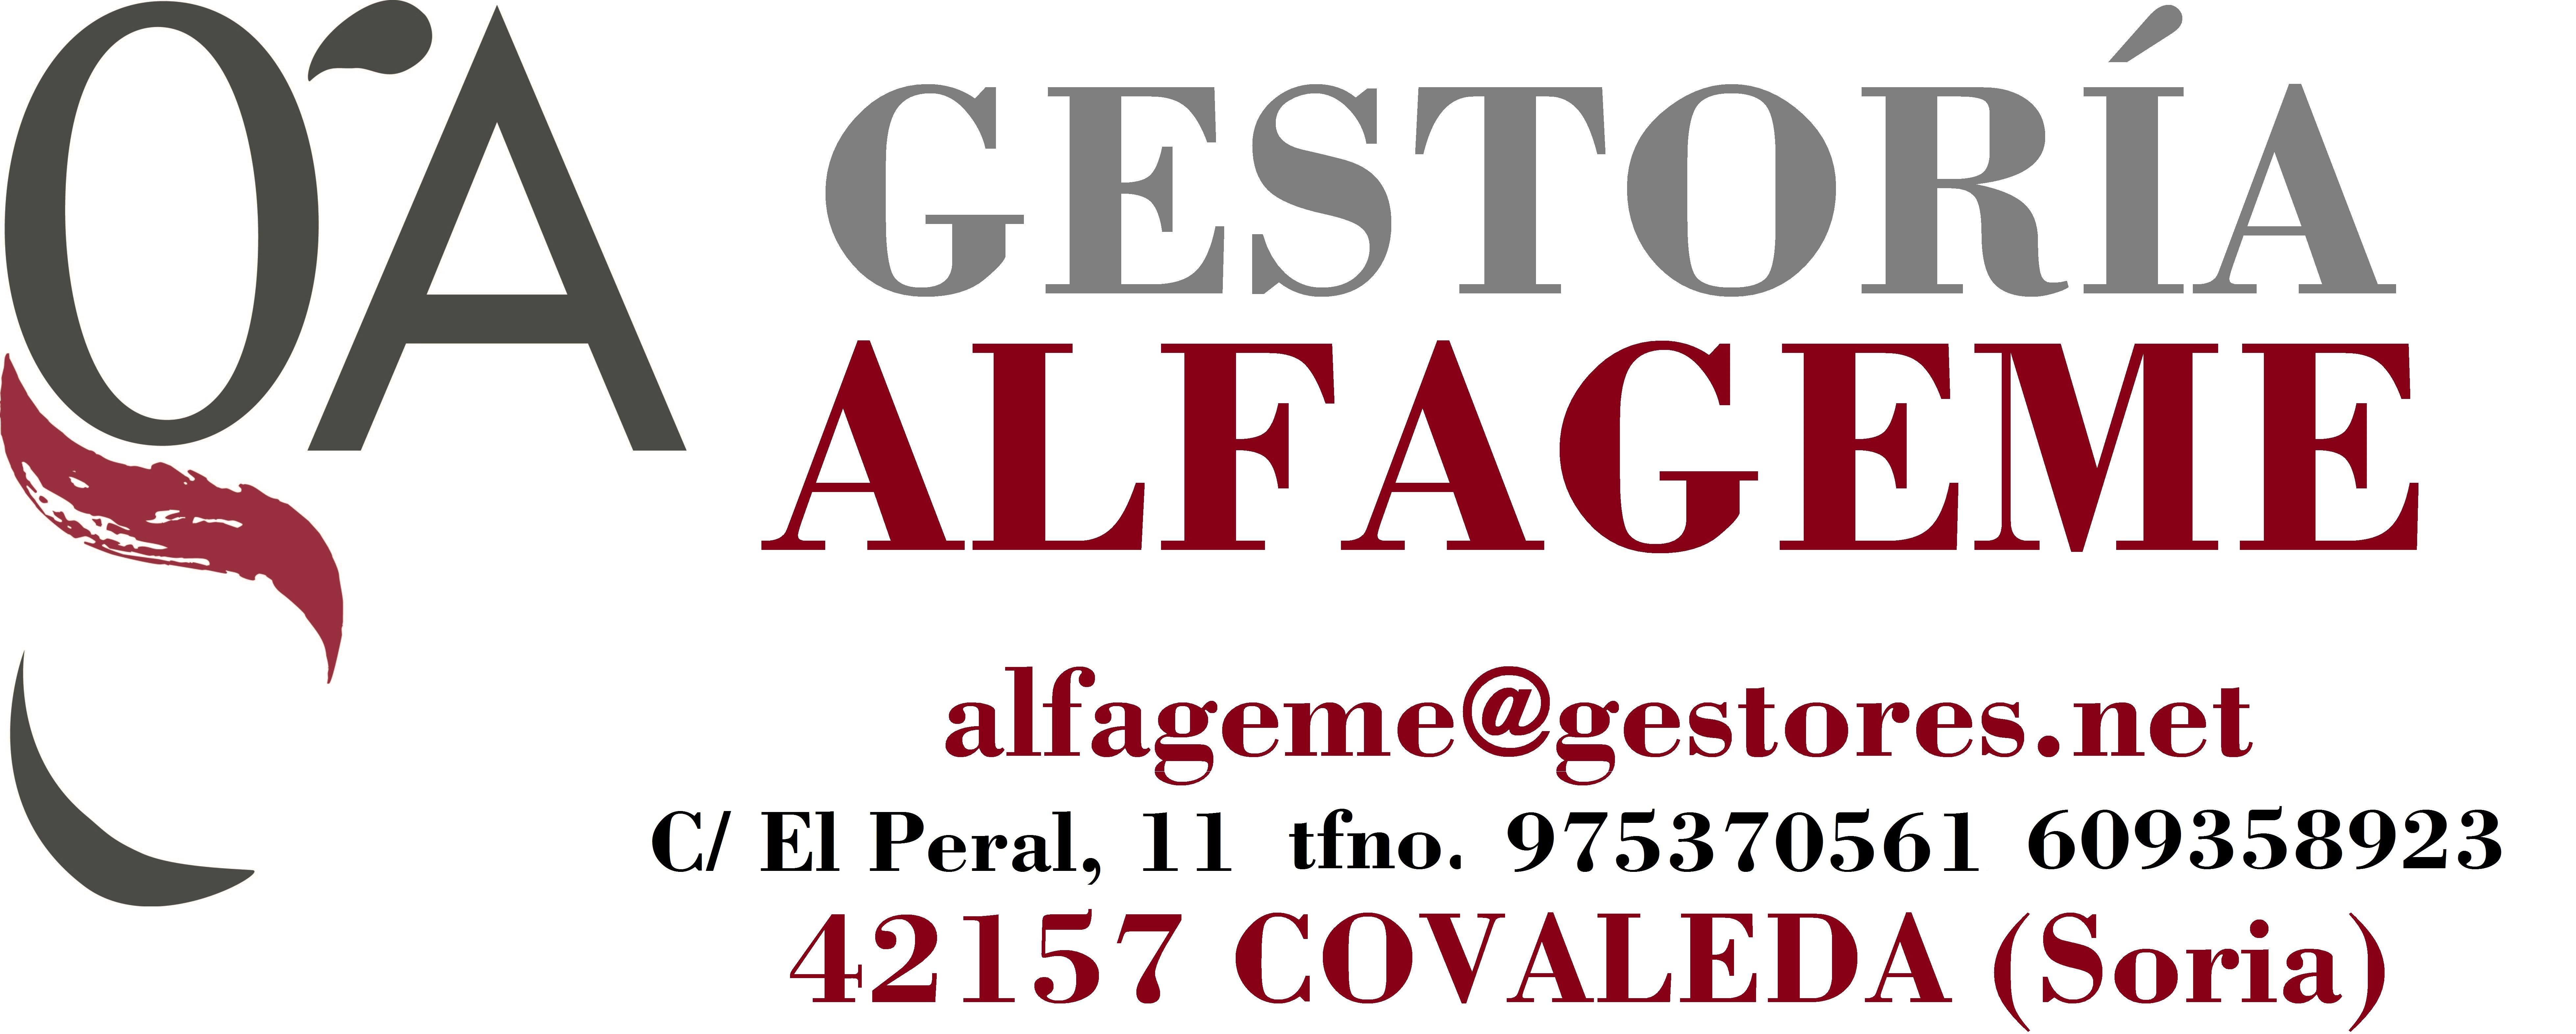 GESTORIA ALFAGEME